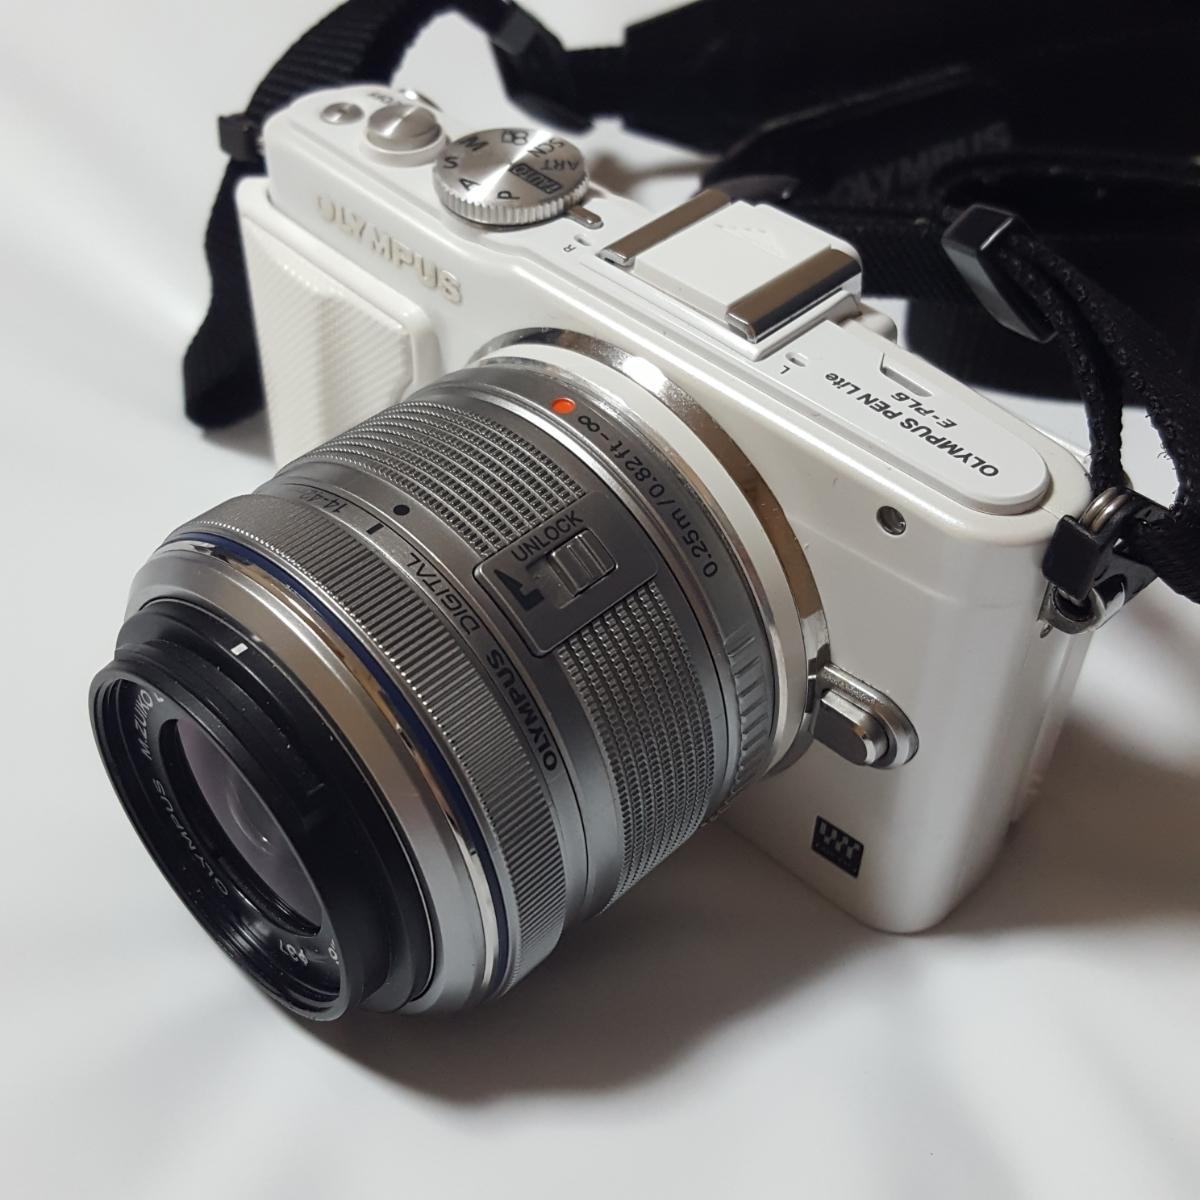 OLYMPUS PEN Lite E-PL6 デジタル一眼カメラ 14-42mm 1:3.5-5.6 Ⅱ R ジャンク 拍卖